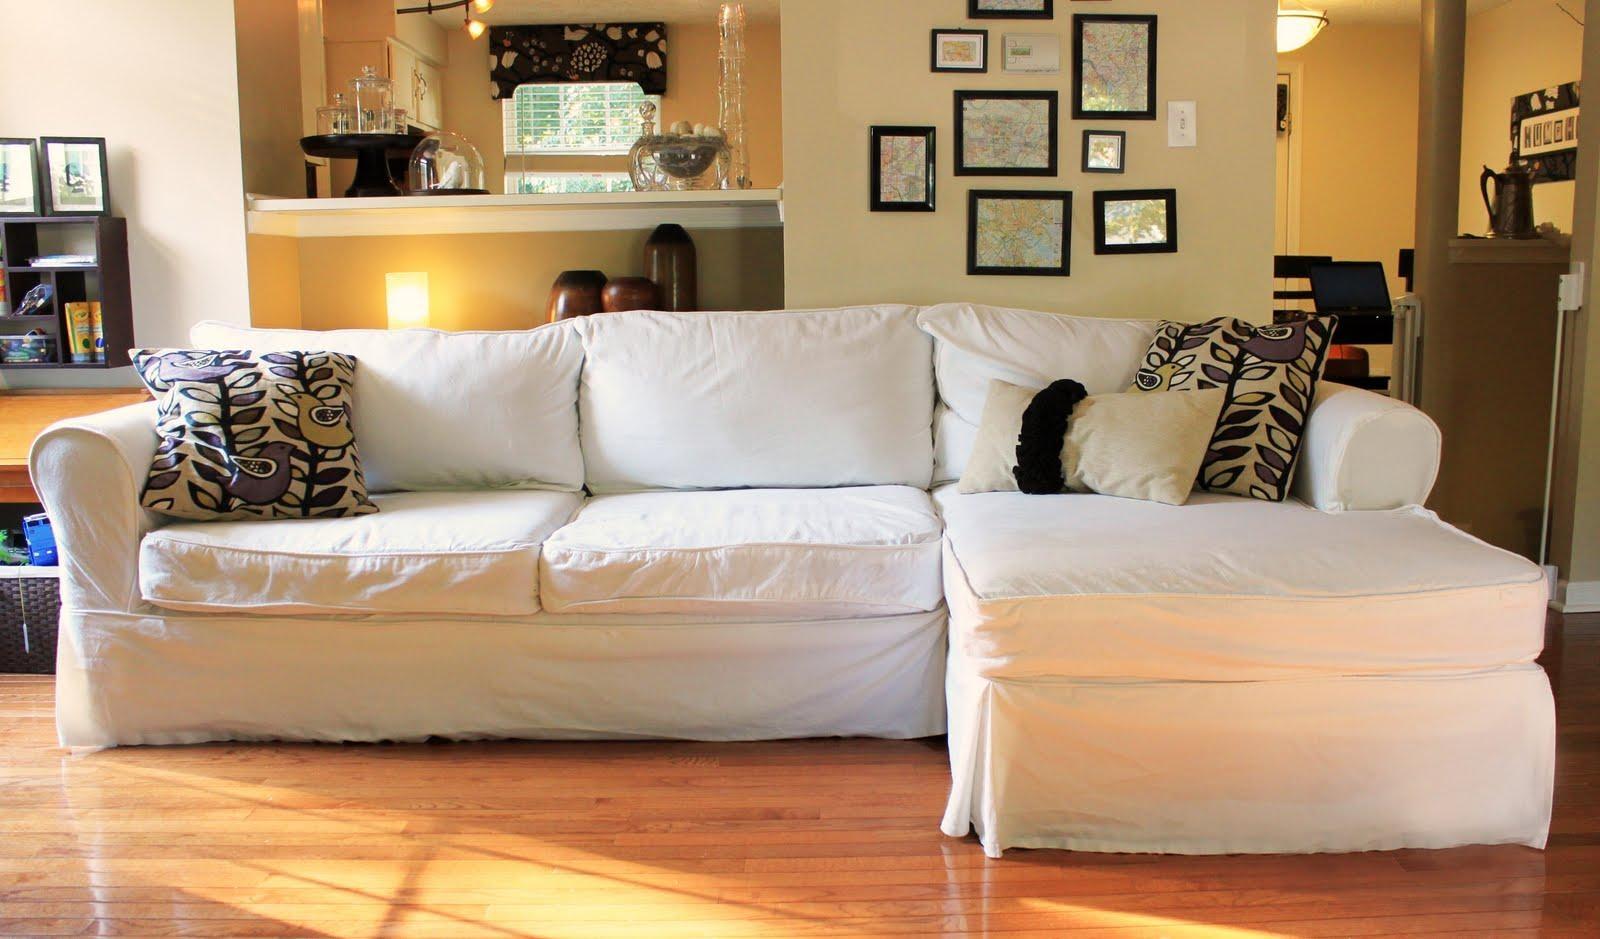 black chair covers walmart guineys 20 photos slipcovers for sofas | sofa ideas